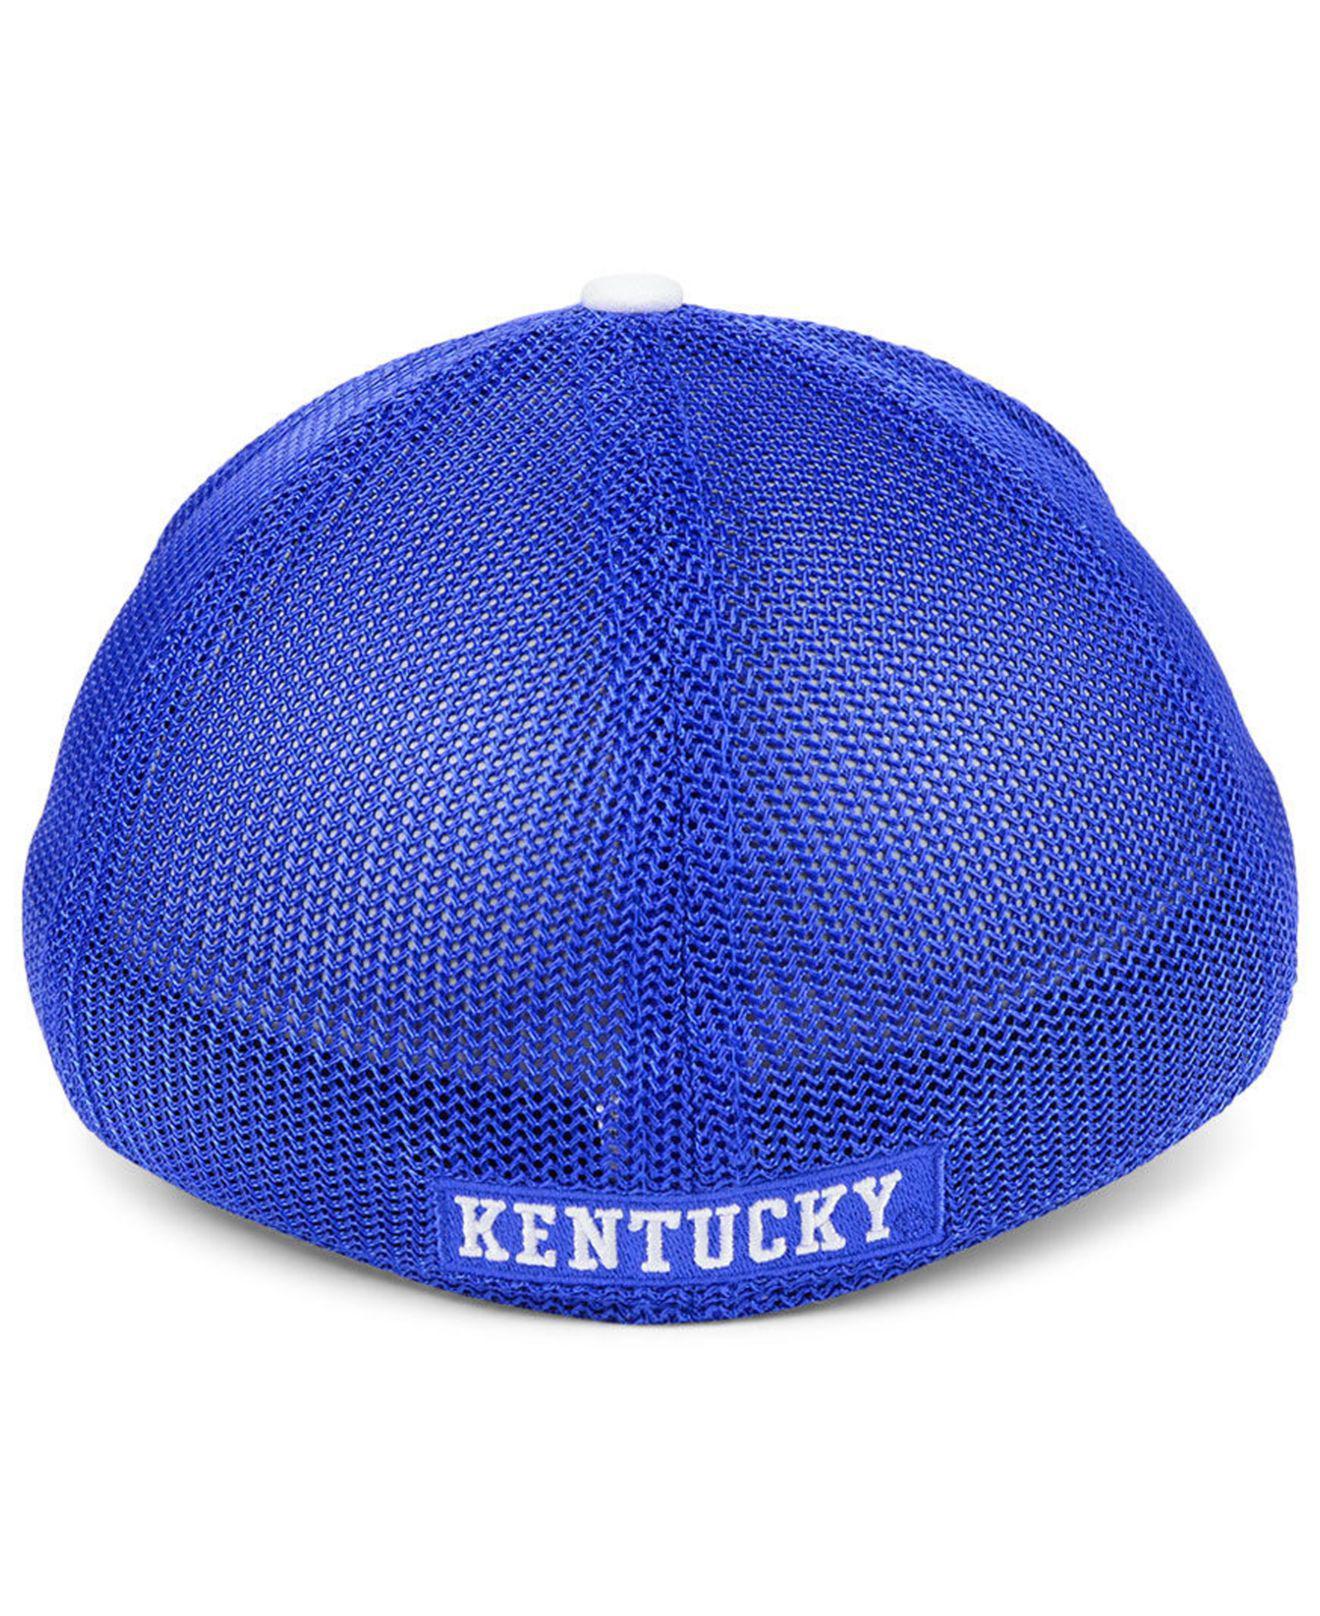 info for 9a349 f6409 ... ebay nike blue kentucky wildcats col aro swooshflex cap for men lyst.  view fullscreen 1f4a3